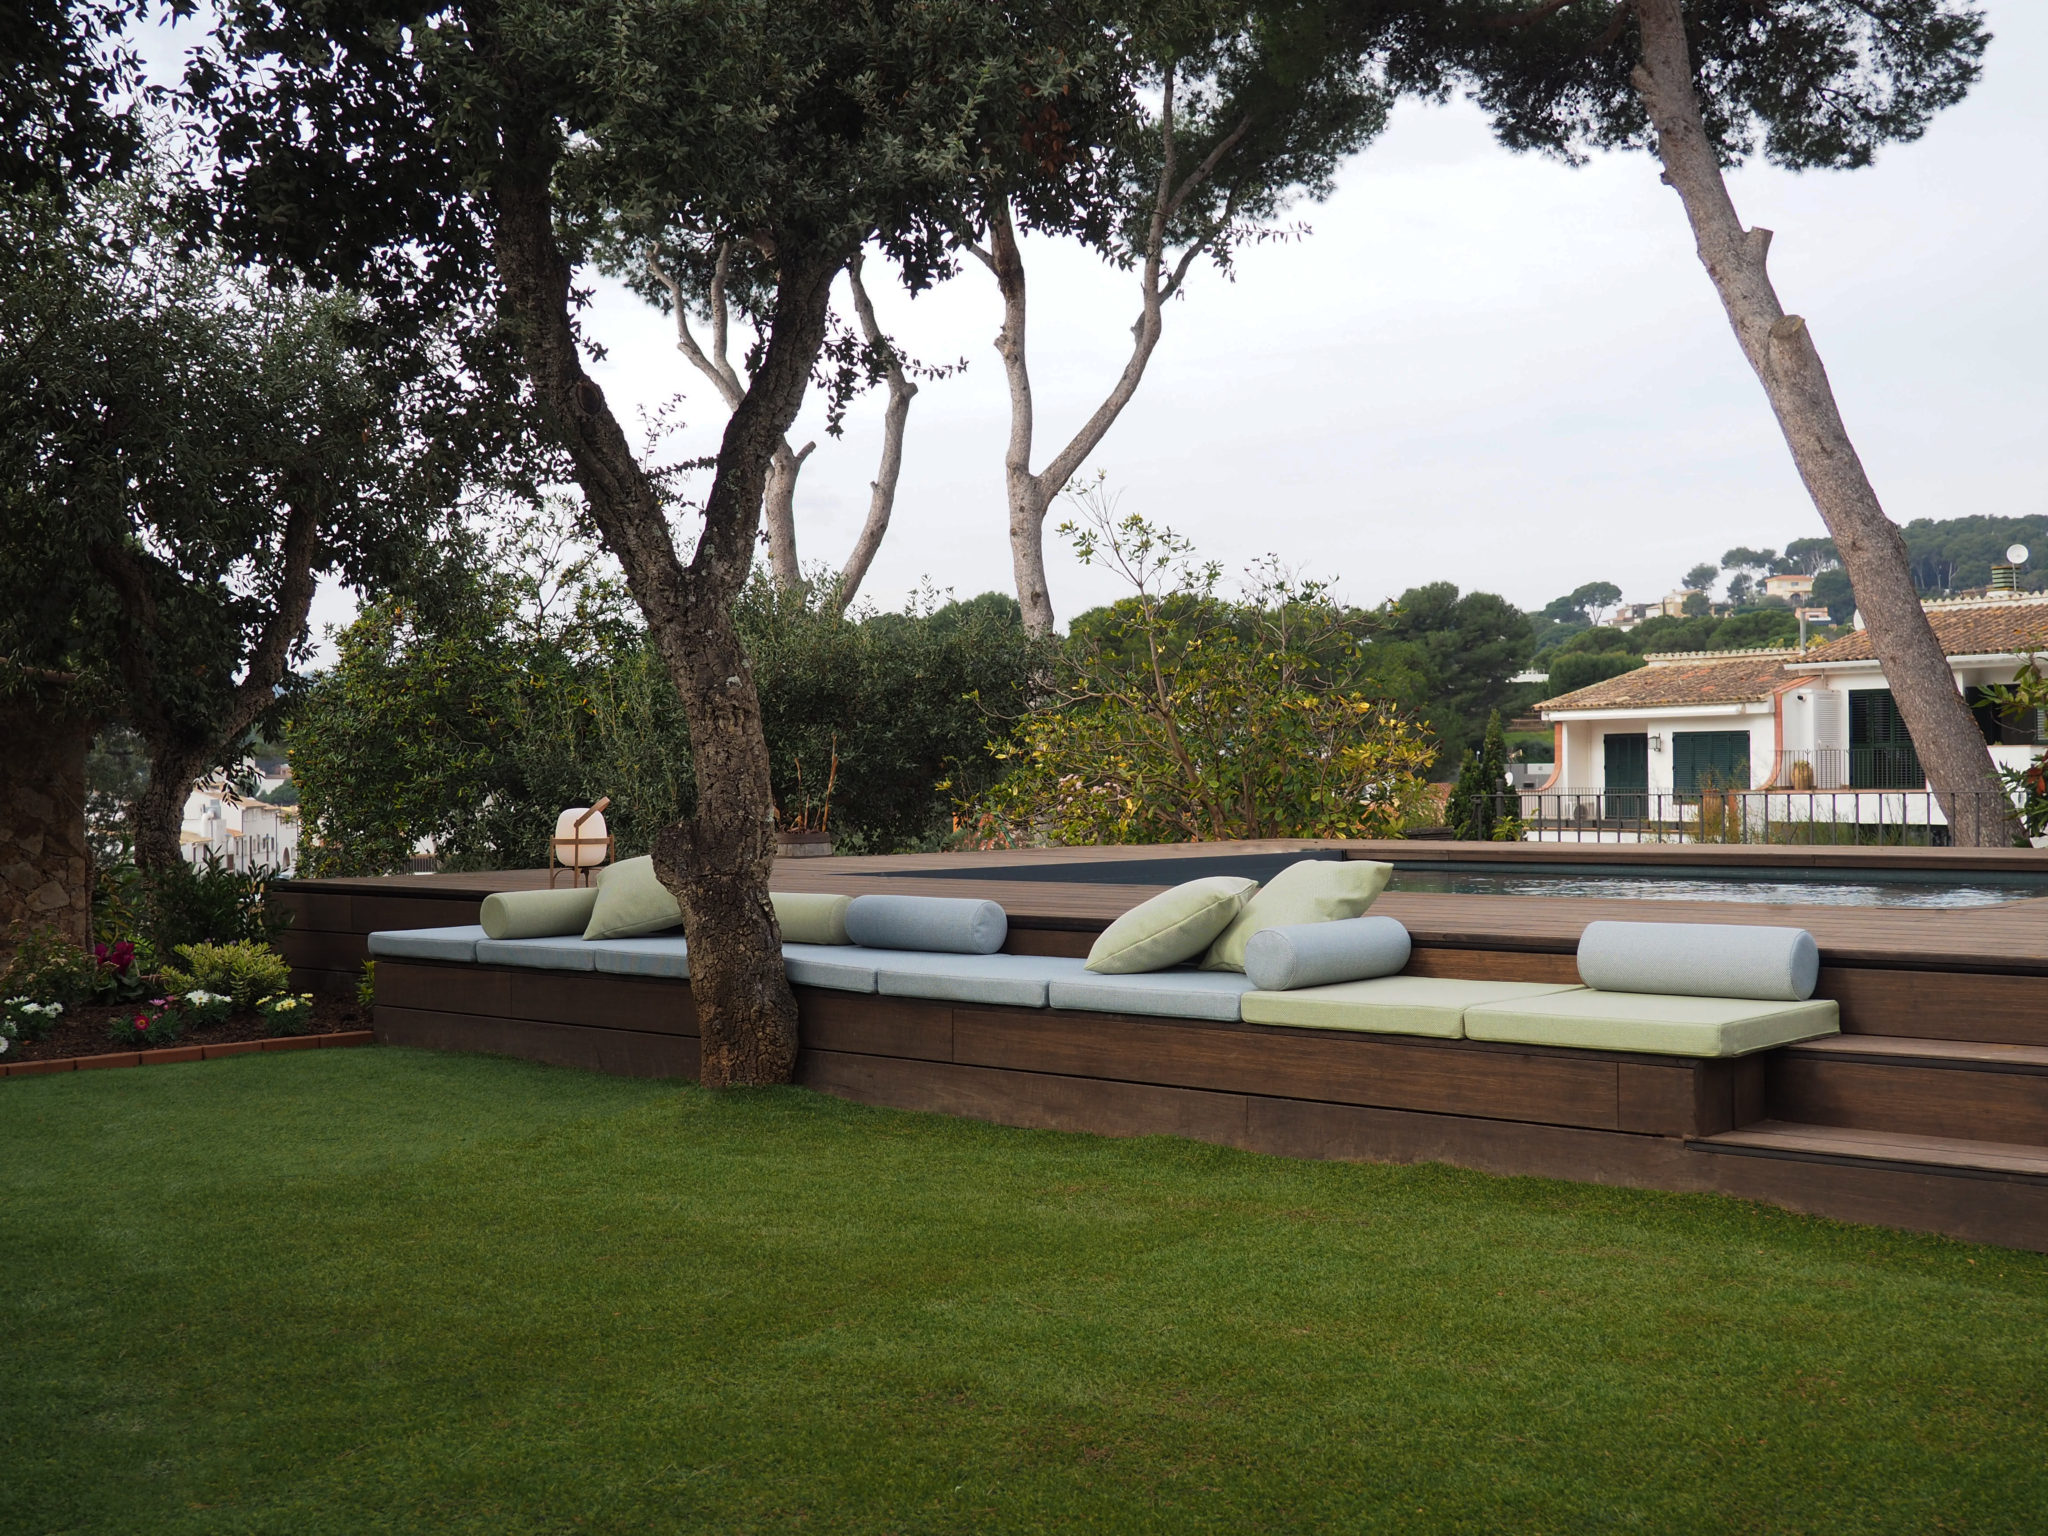 Chillout exterior piscina por Rosa Colet Interior Design. Fotografia